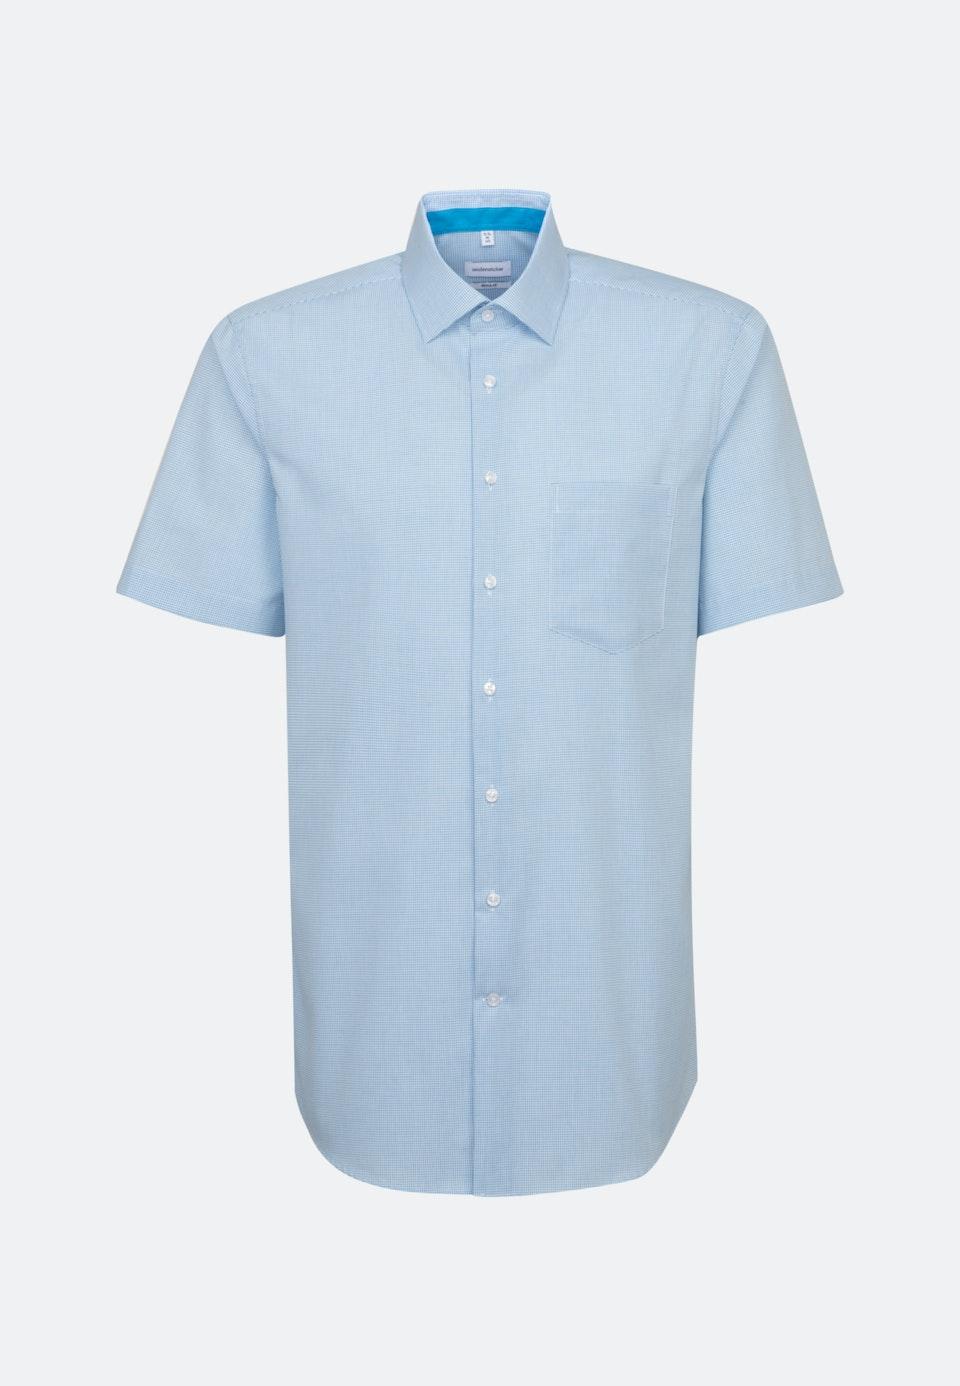 Bügelfreies Popeline Kurzarm Business Hemd in Regular mit Kentkragen in Türkis/Petrol    Seidensticker Onlineshop